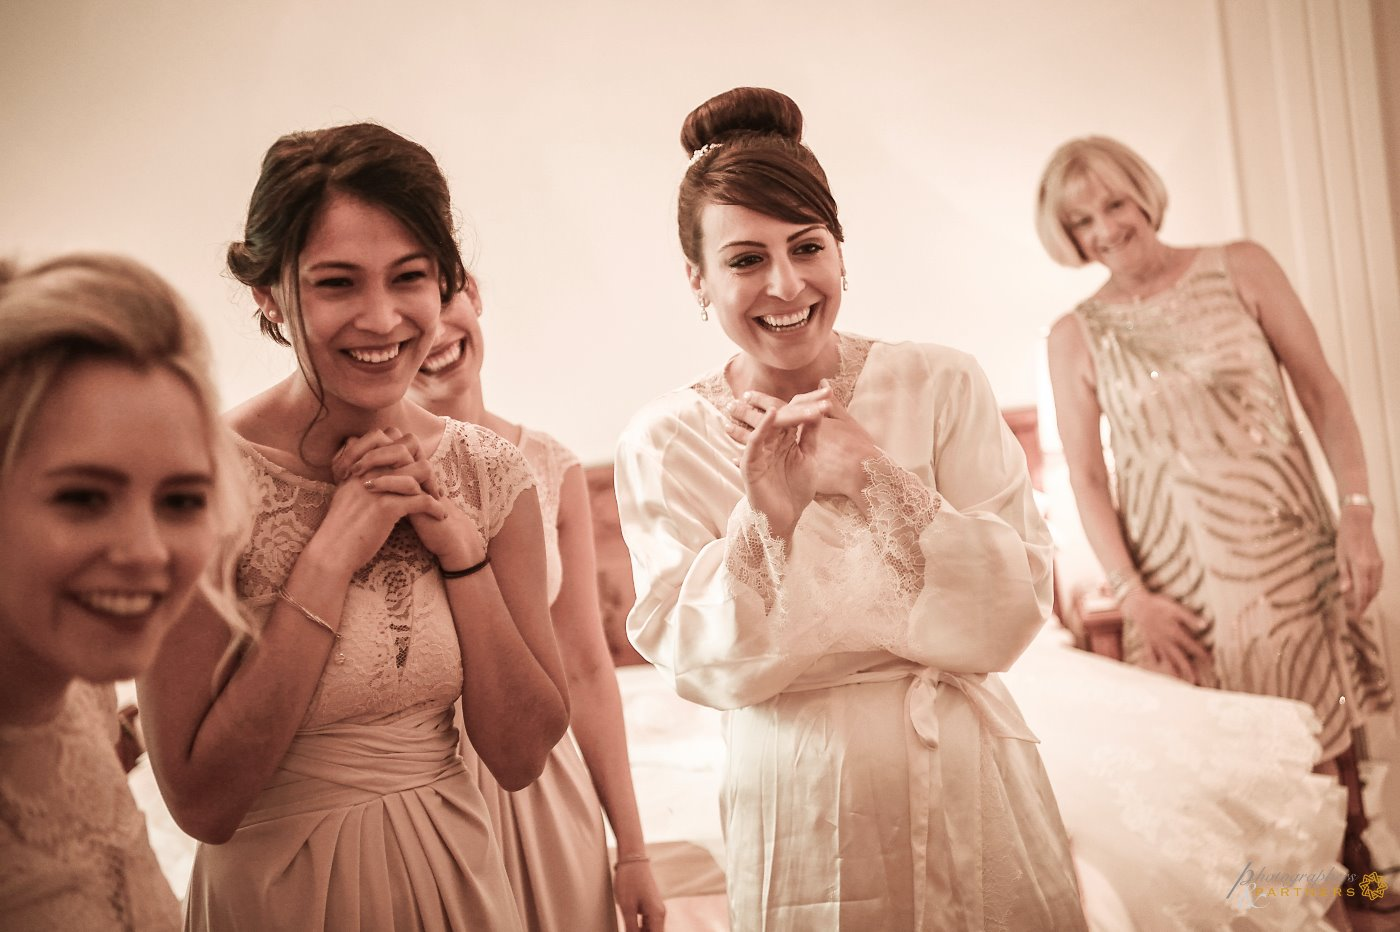 photographer_weddings_sirmione_03.jpg